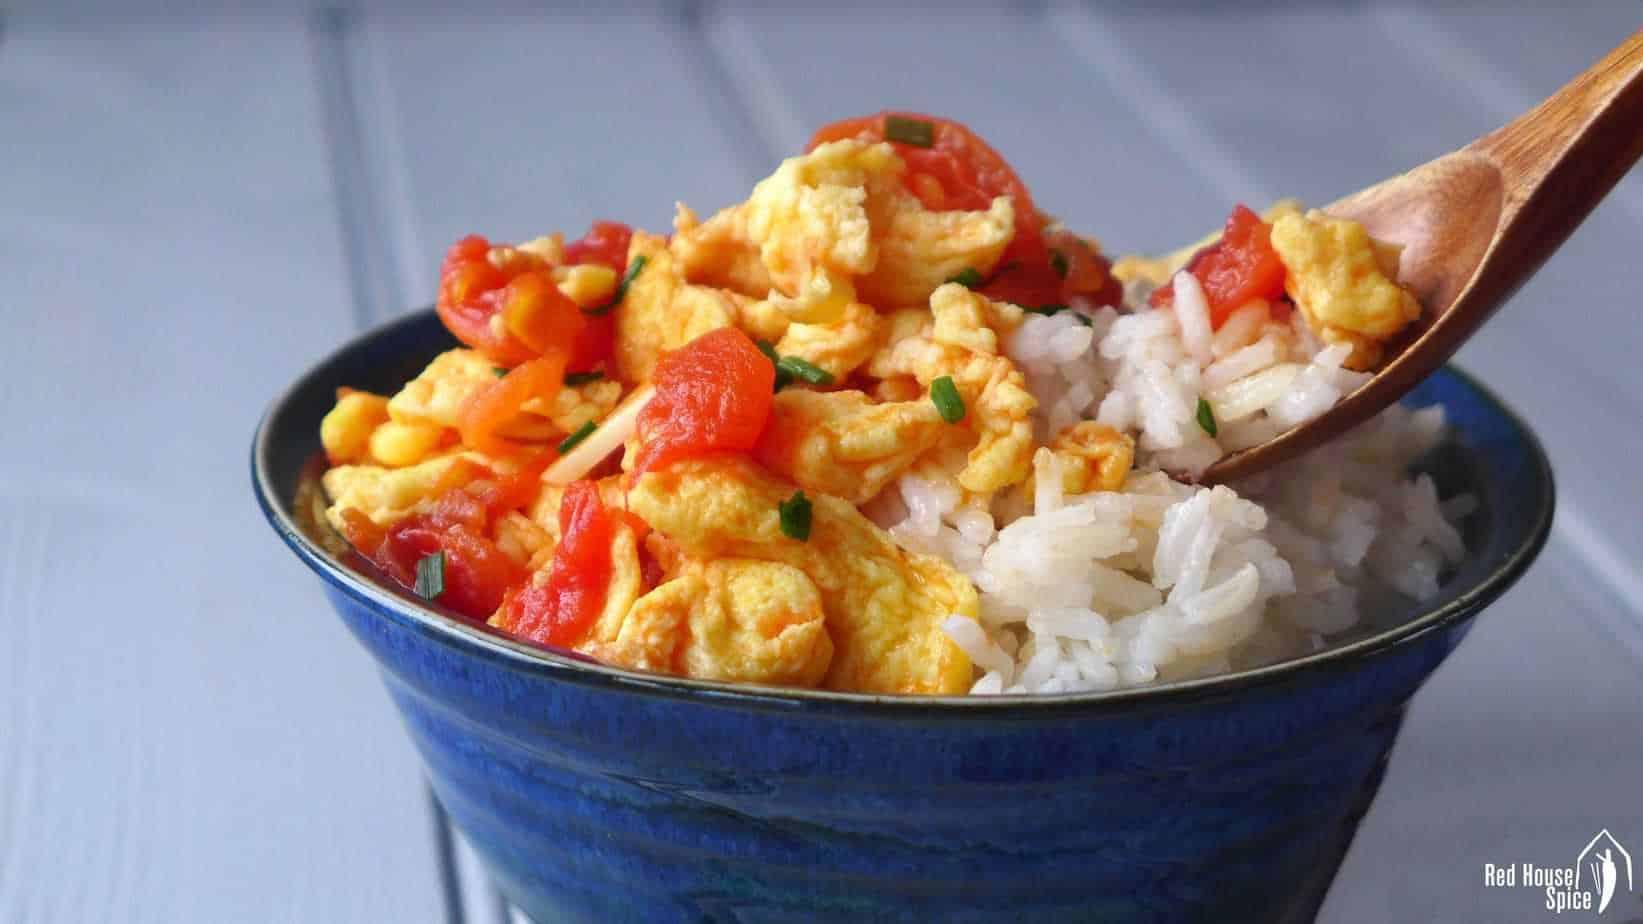 Tomato and egg stir-fry (番茄炒蛋)